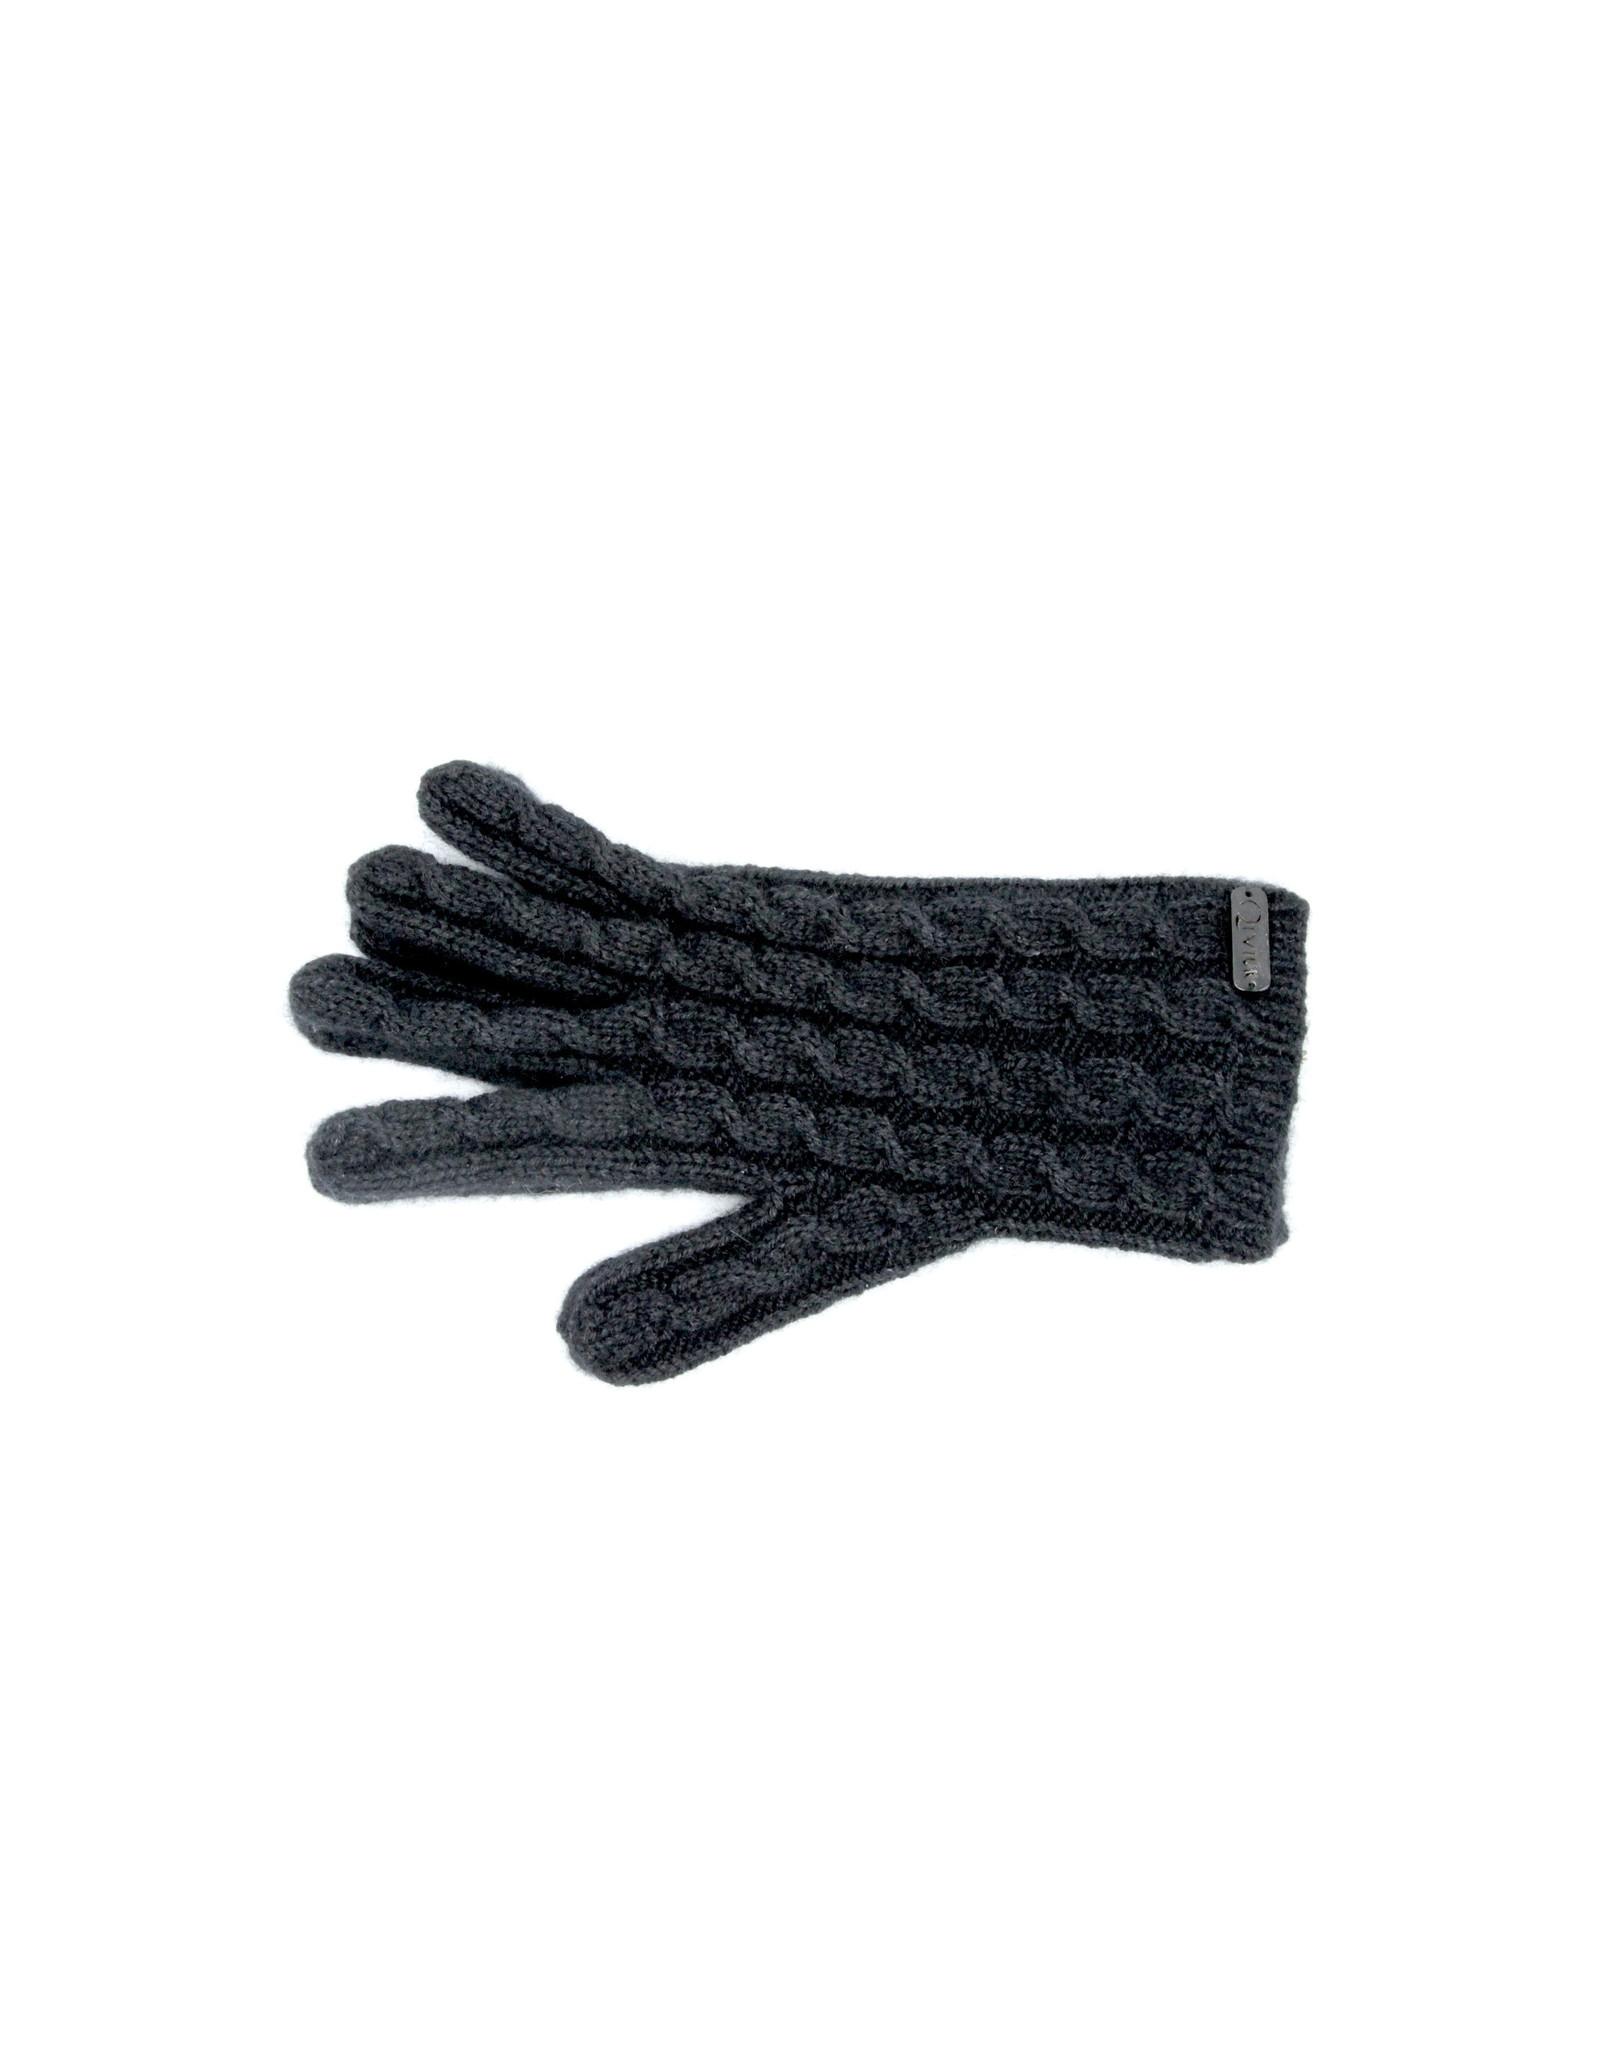 Gants Cable - 45% Qiviuk 45% Merino 10% Silk